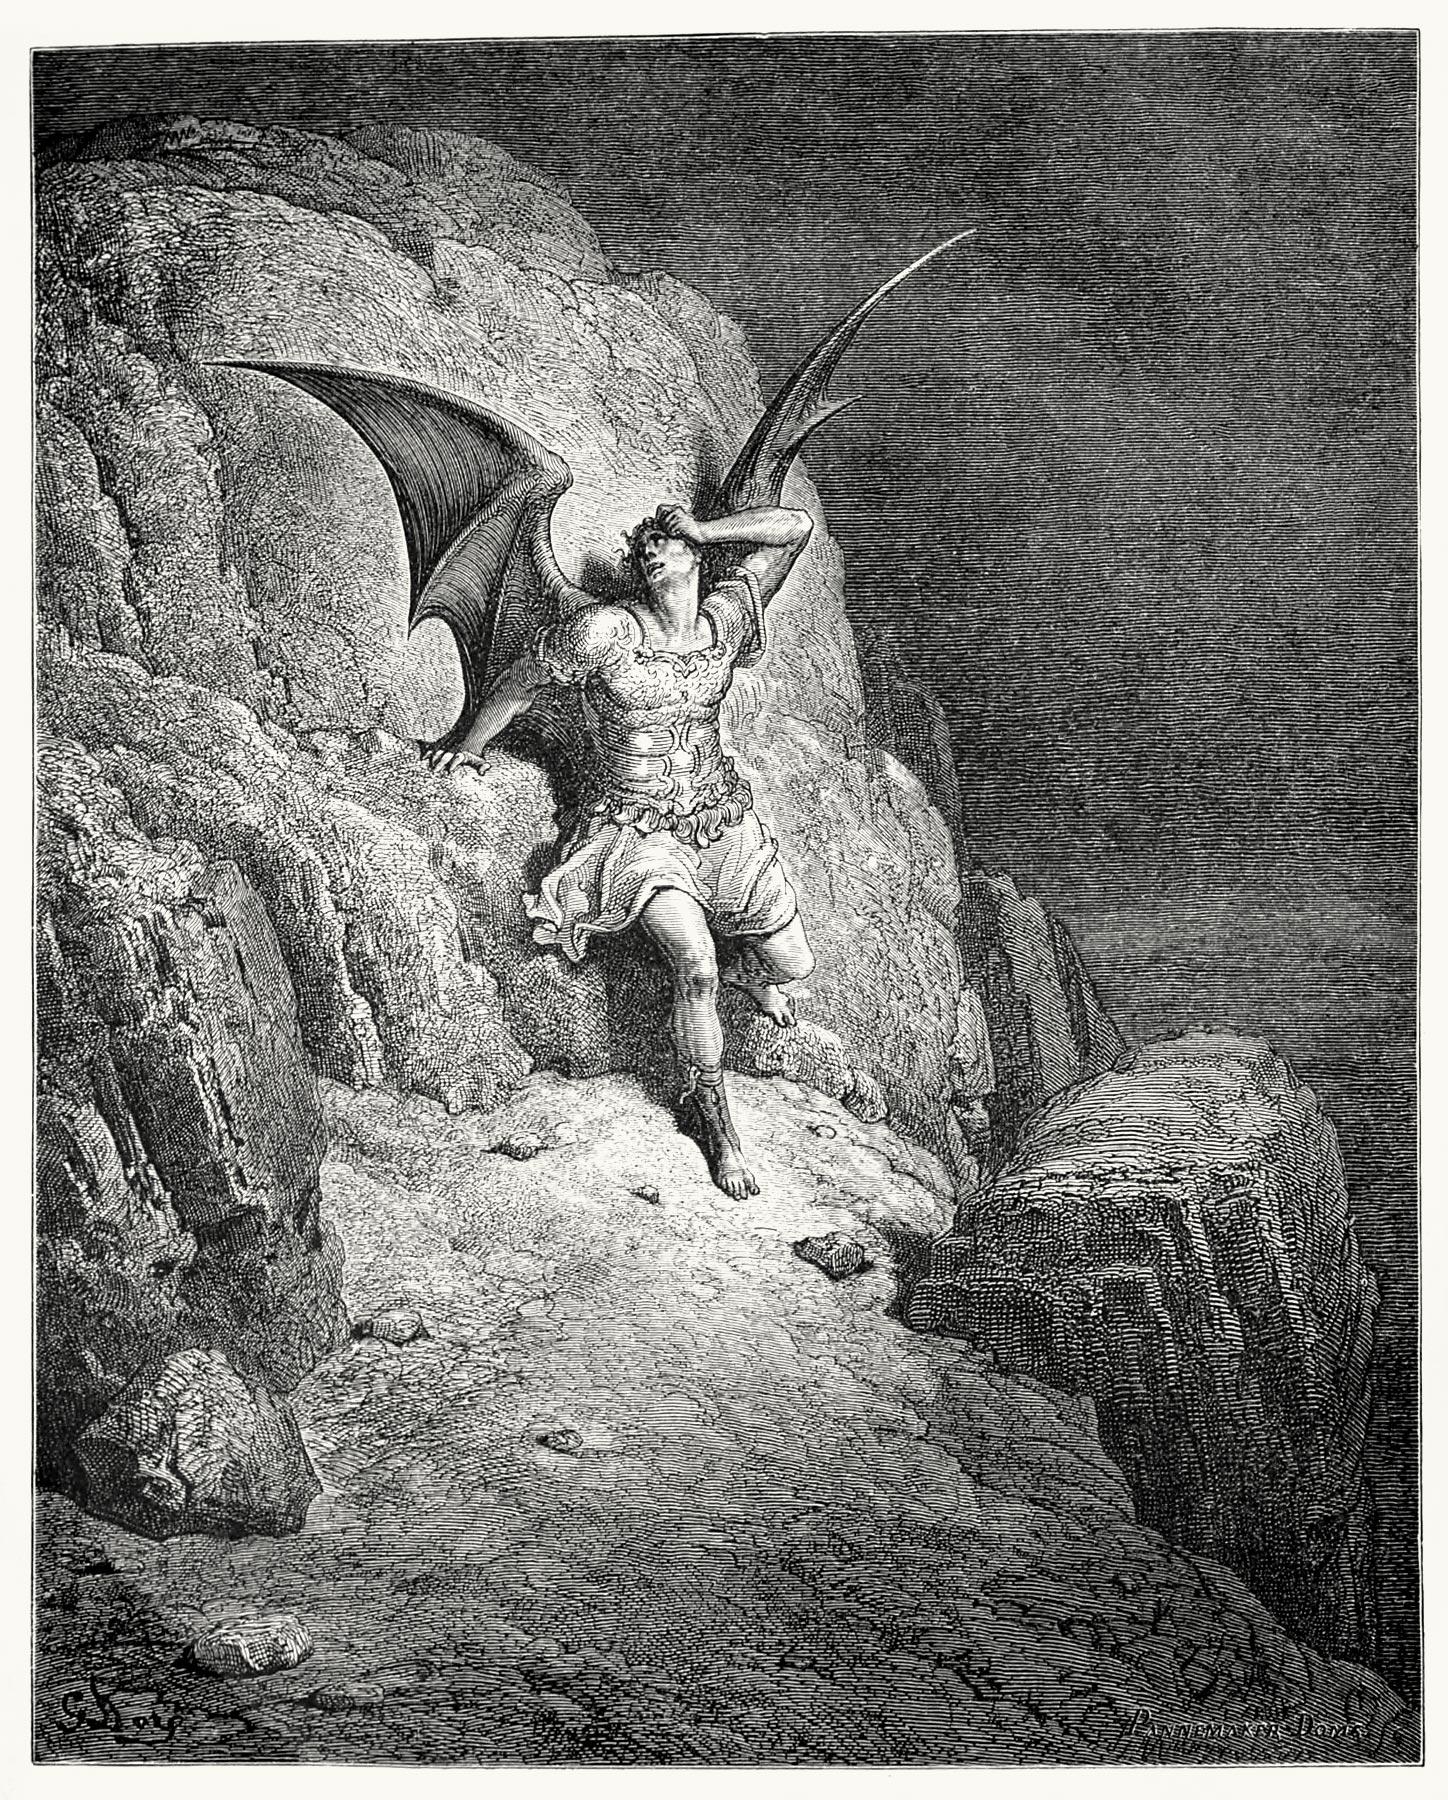 Satan Sin And Death Paradise Lost Book: Books Behind Pictures Books Behind Pictures